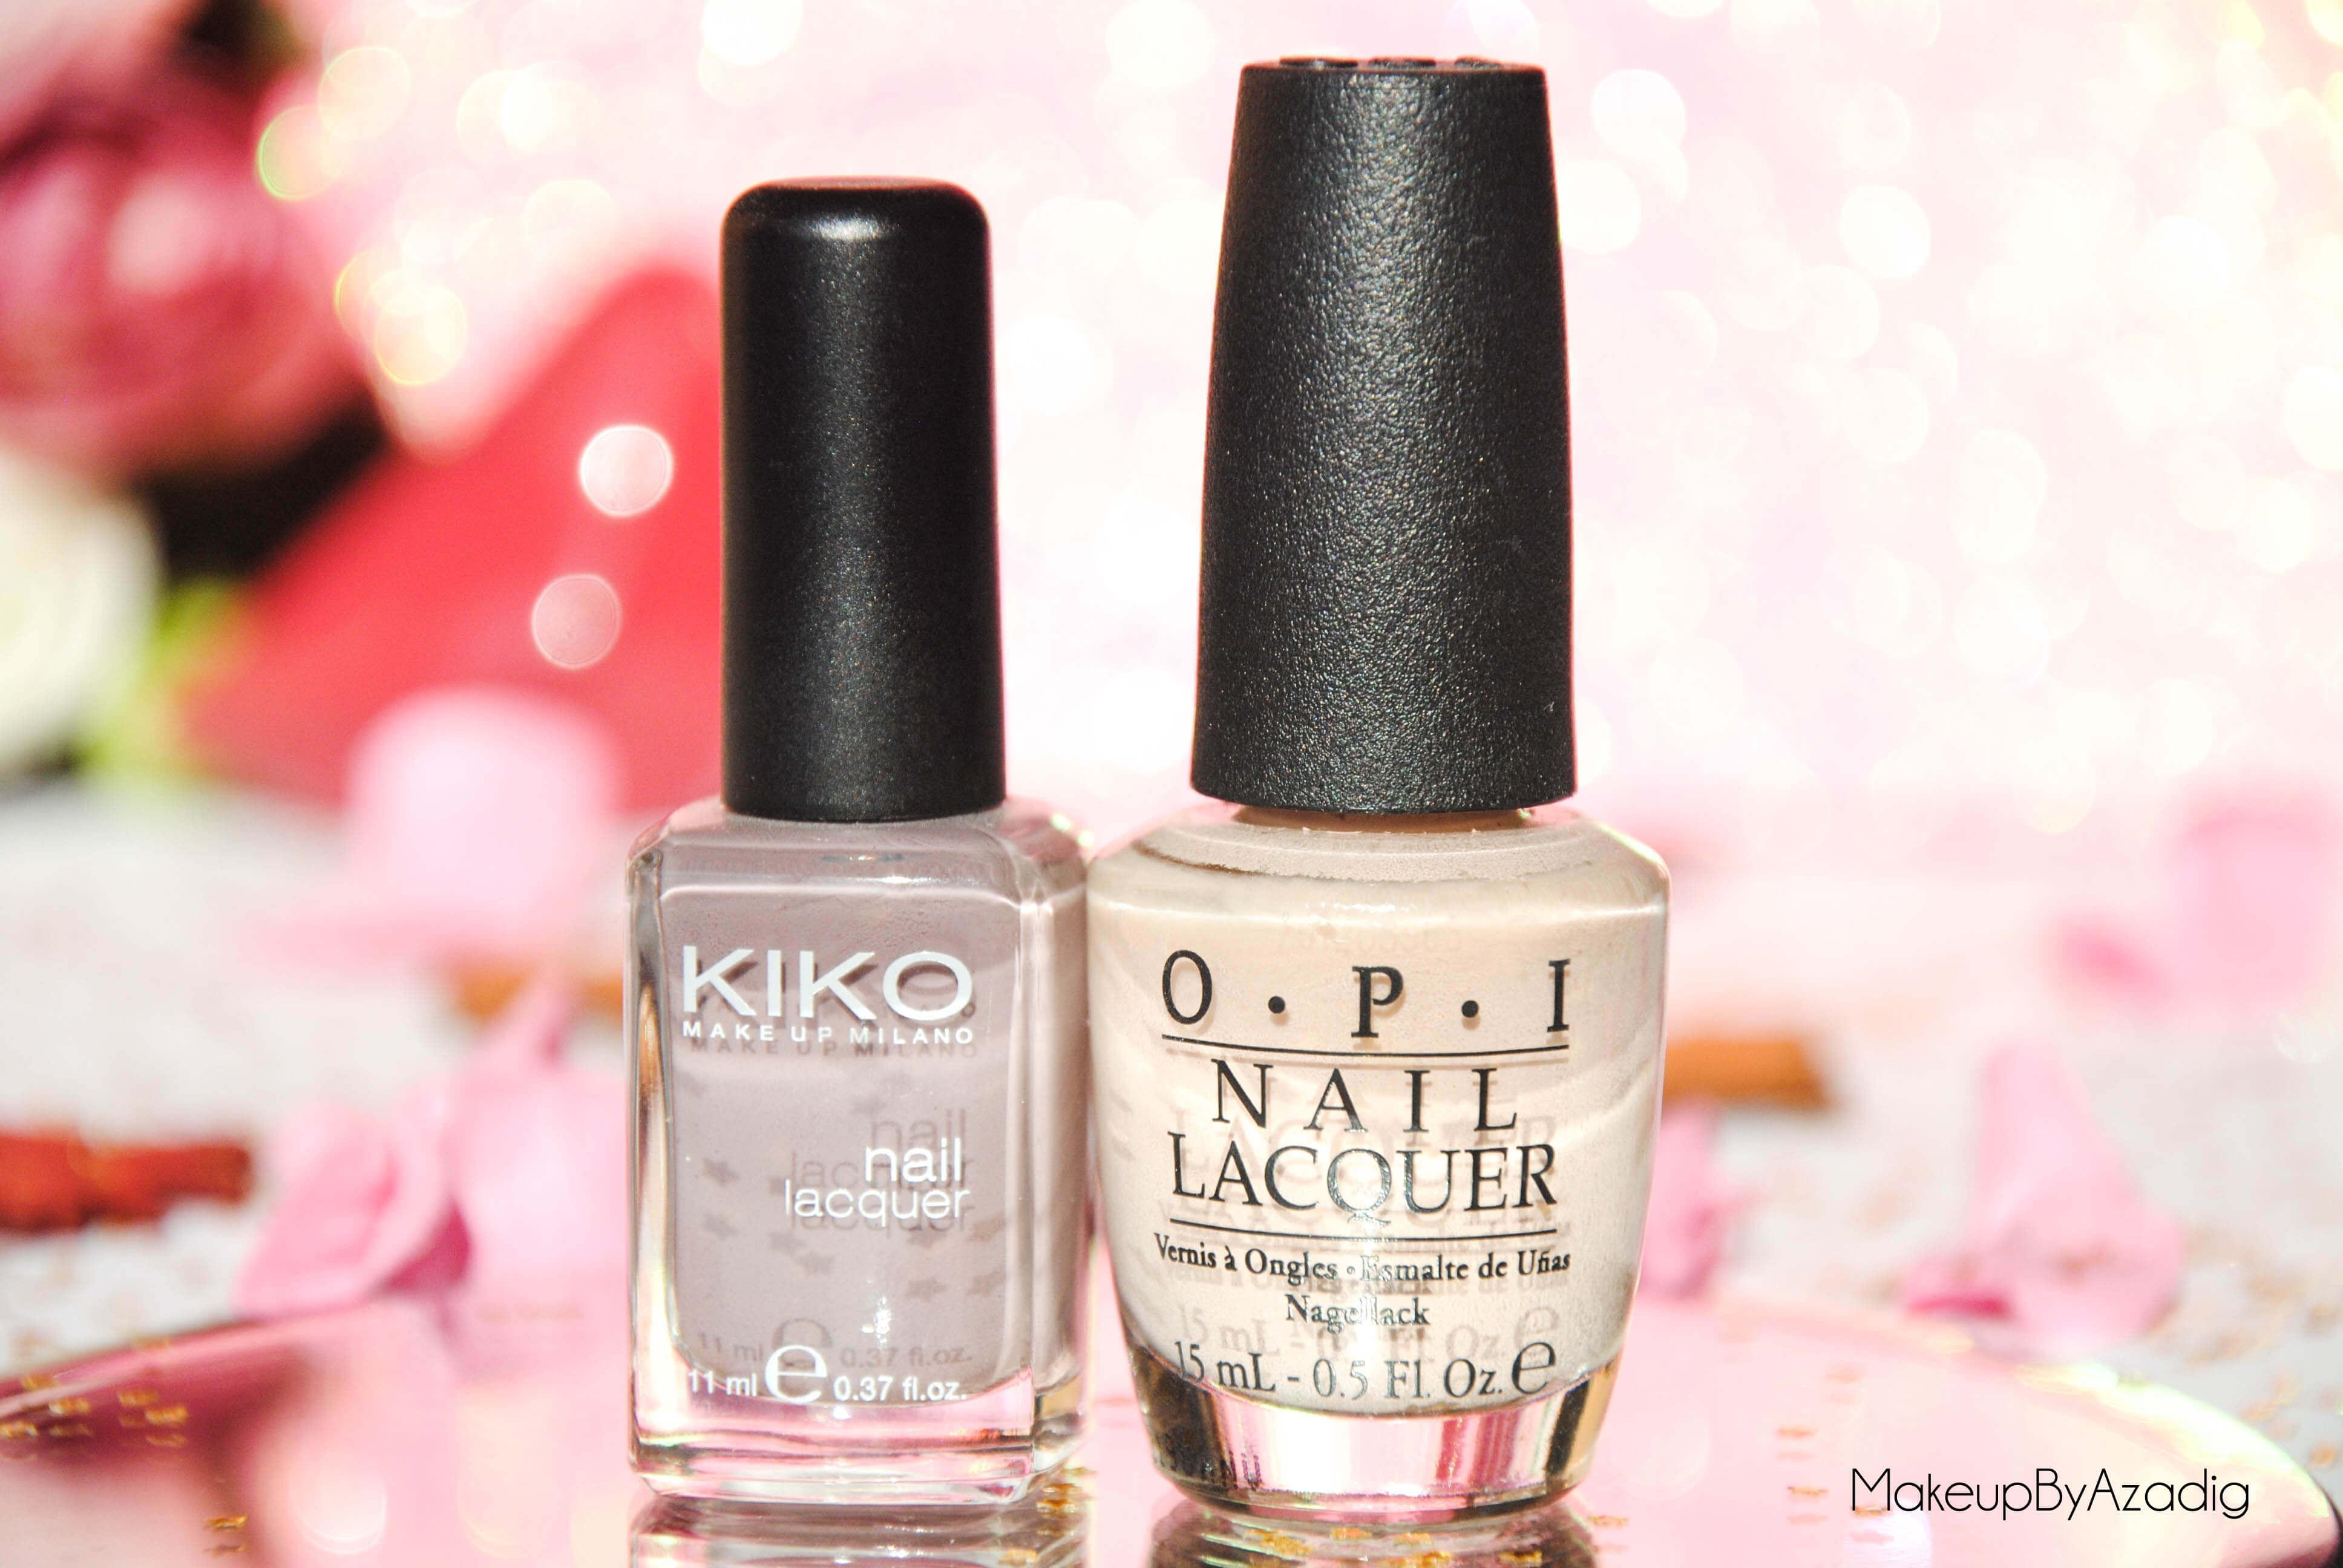 makeupbyazadig-vernis-tendance-automne-nails-autumn-formula-x-monop-makeup-troyes-dijon-paris-sandrea26france-camaieu-opi-kiko-sephora-mavala-essie-nude